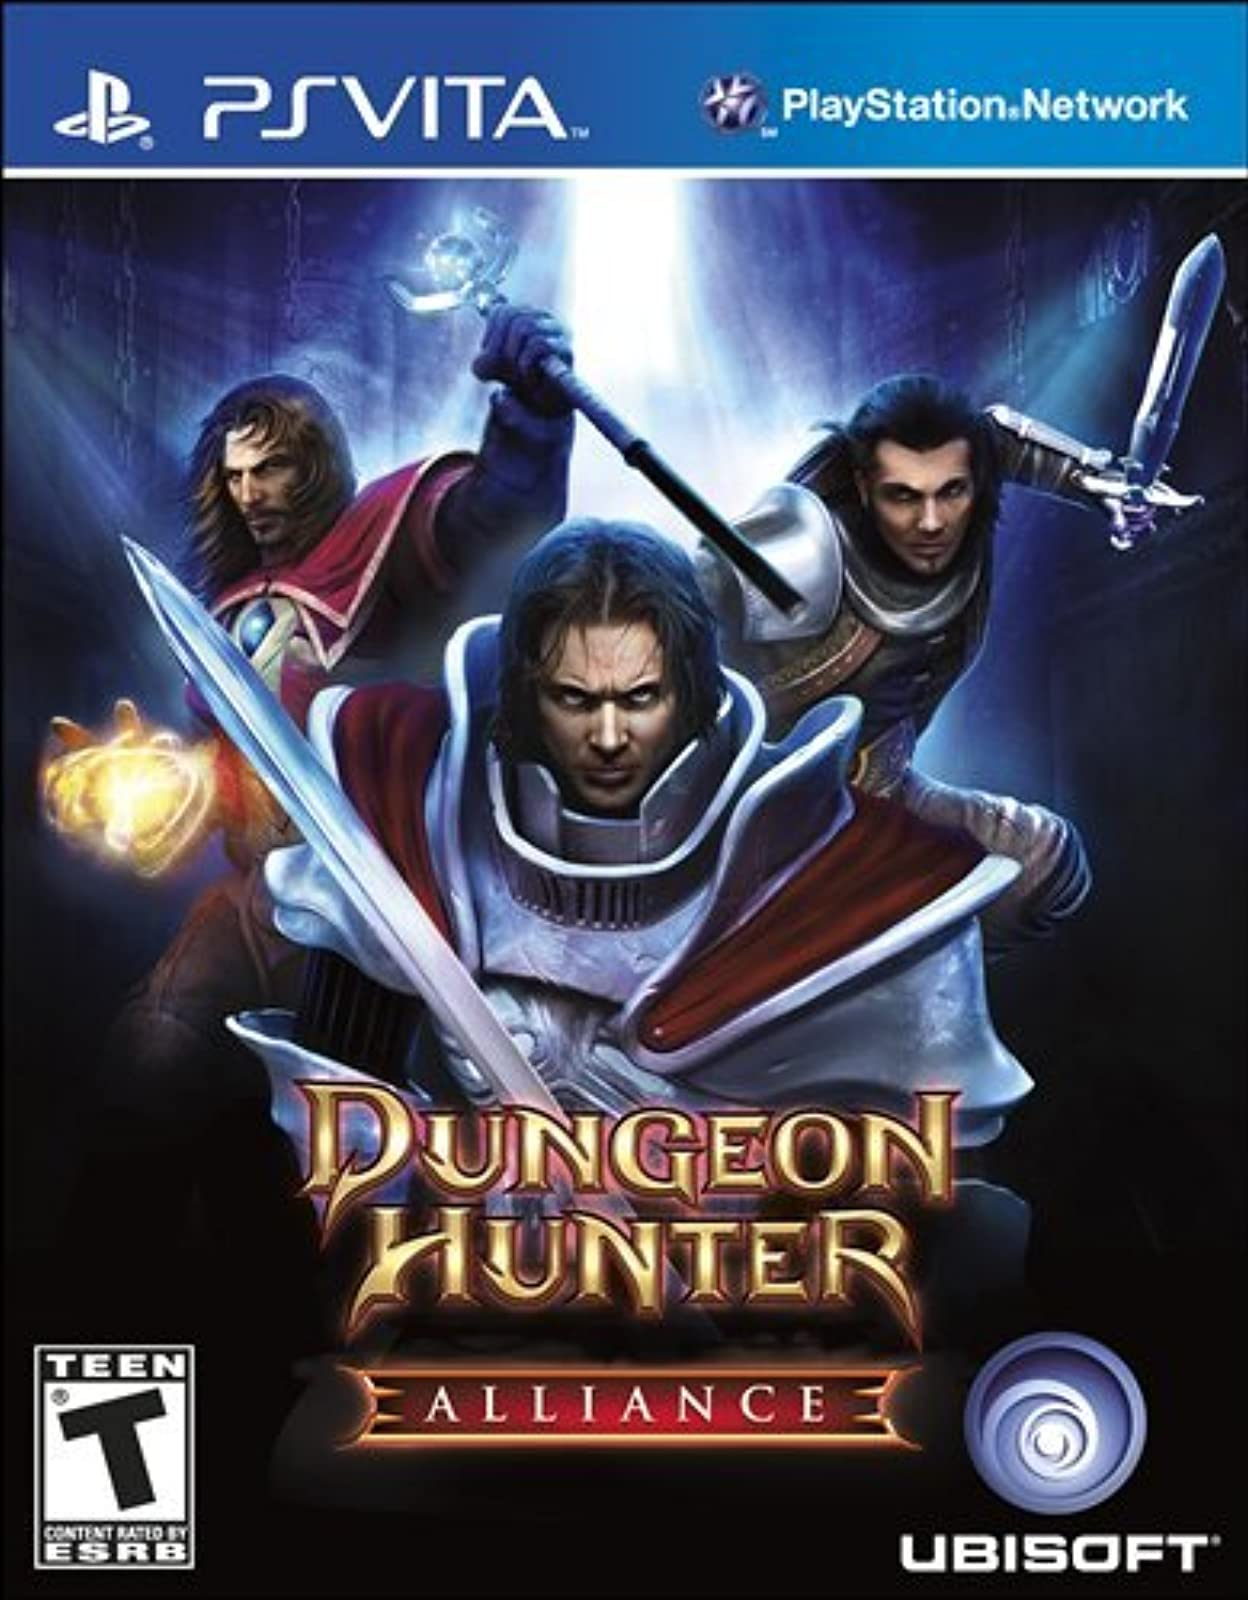 Dungeon Hunter Alliance PlayStation Vita For Ps Vita RPG